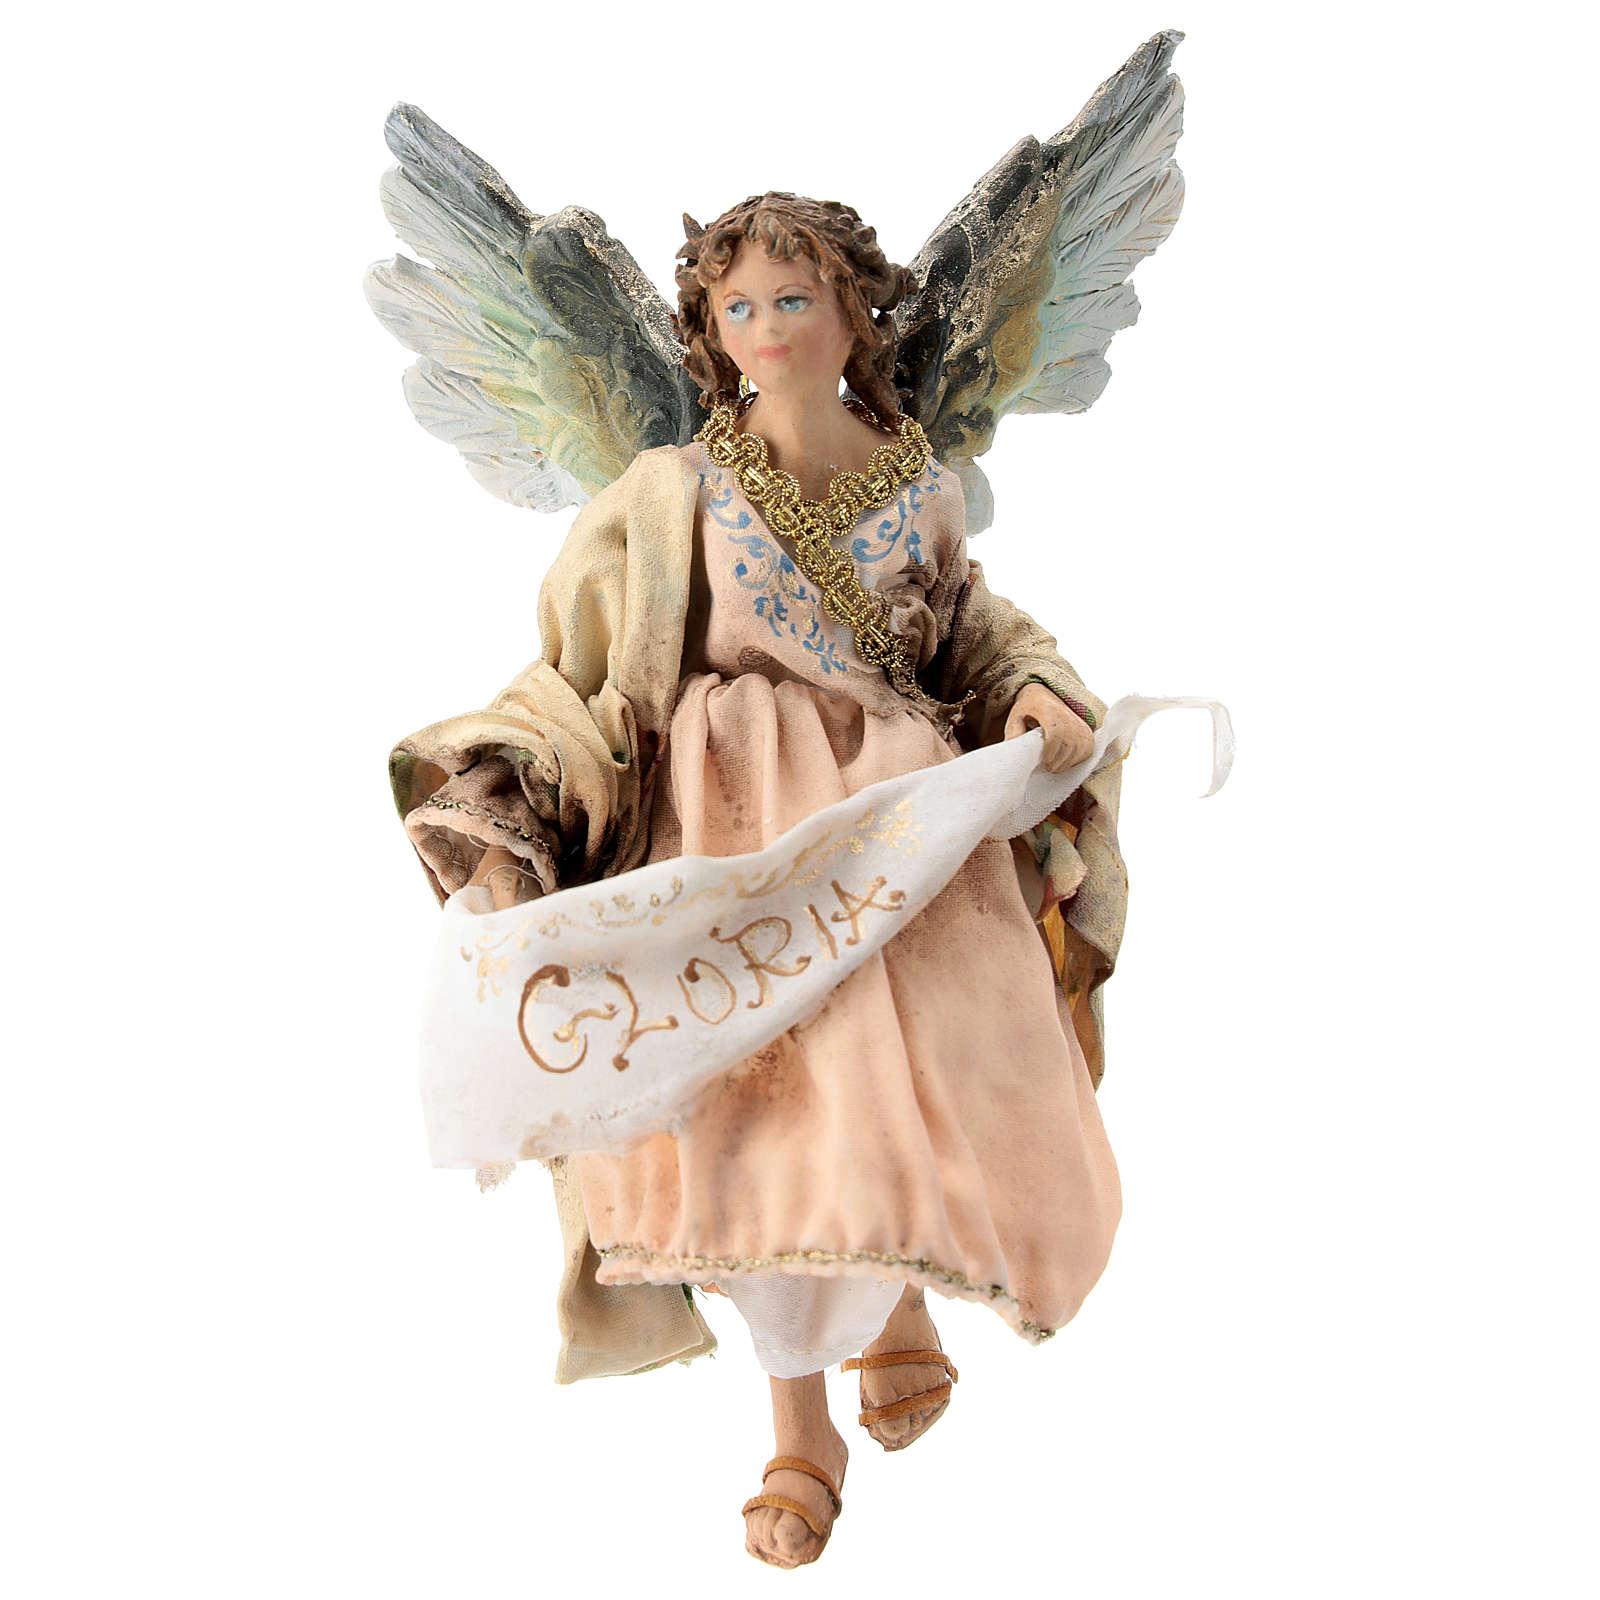 Nativity scene figurine, Angel with Gloria banner and pink robe by Angela Tripi 13 cm 4